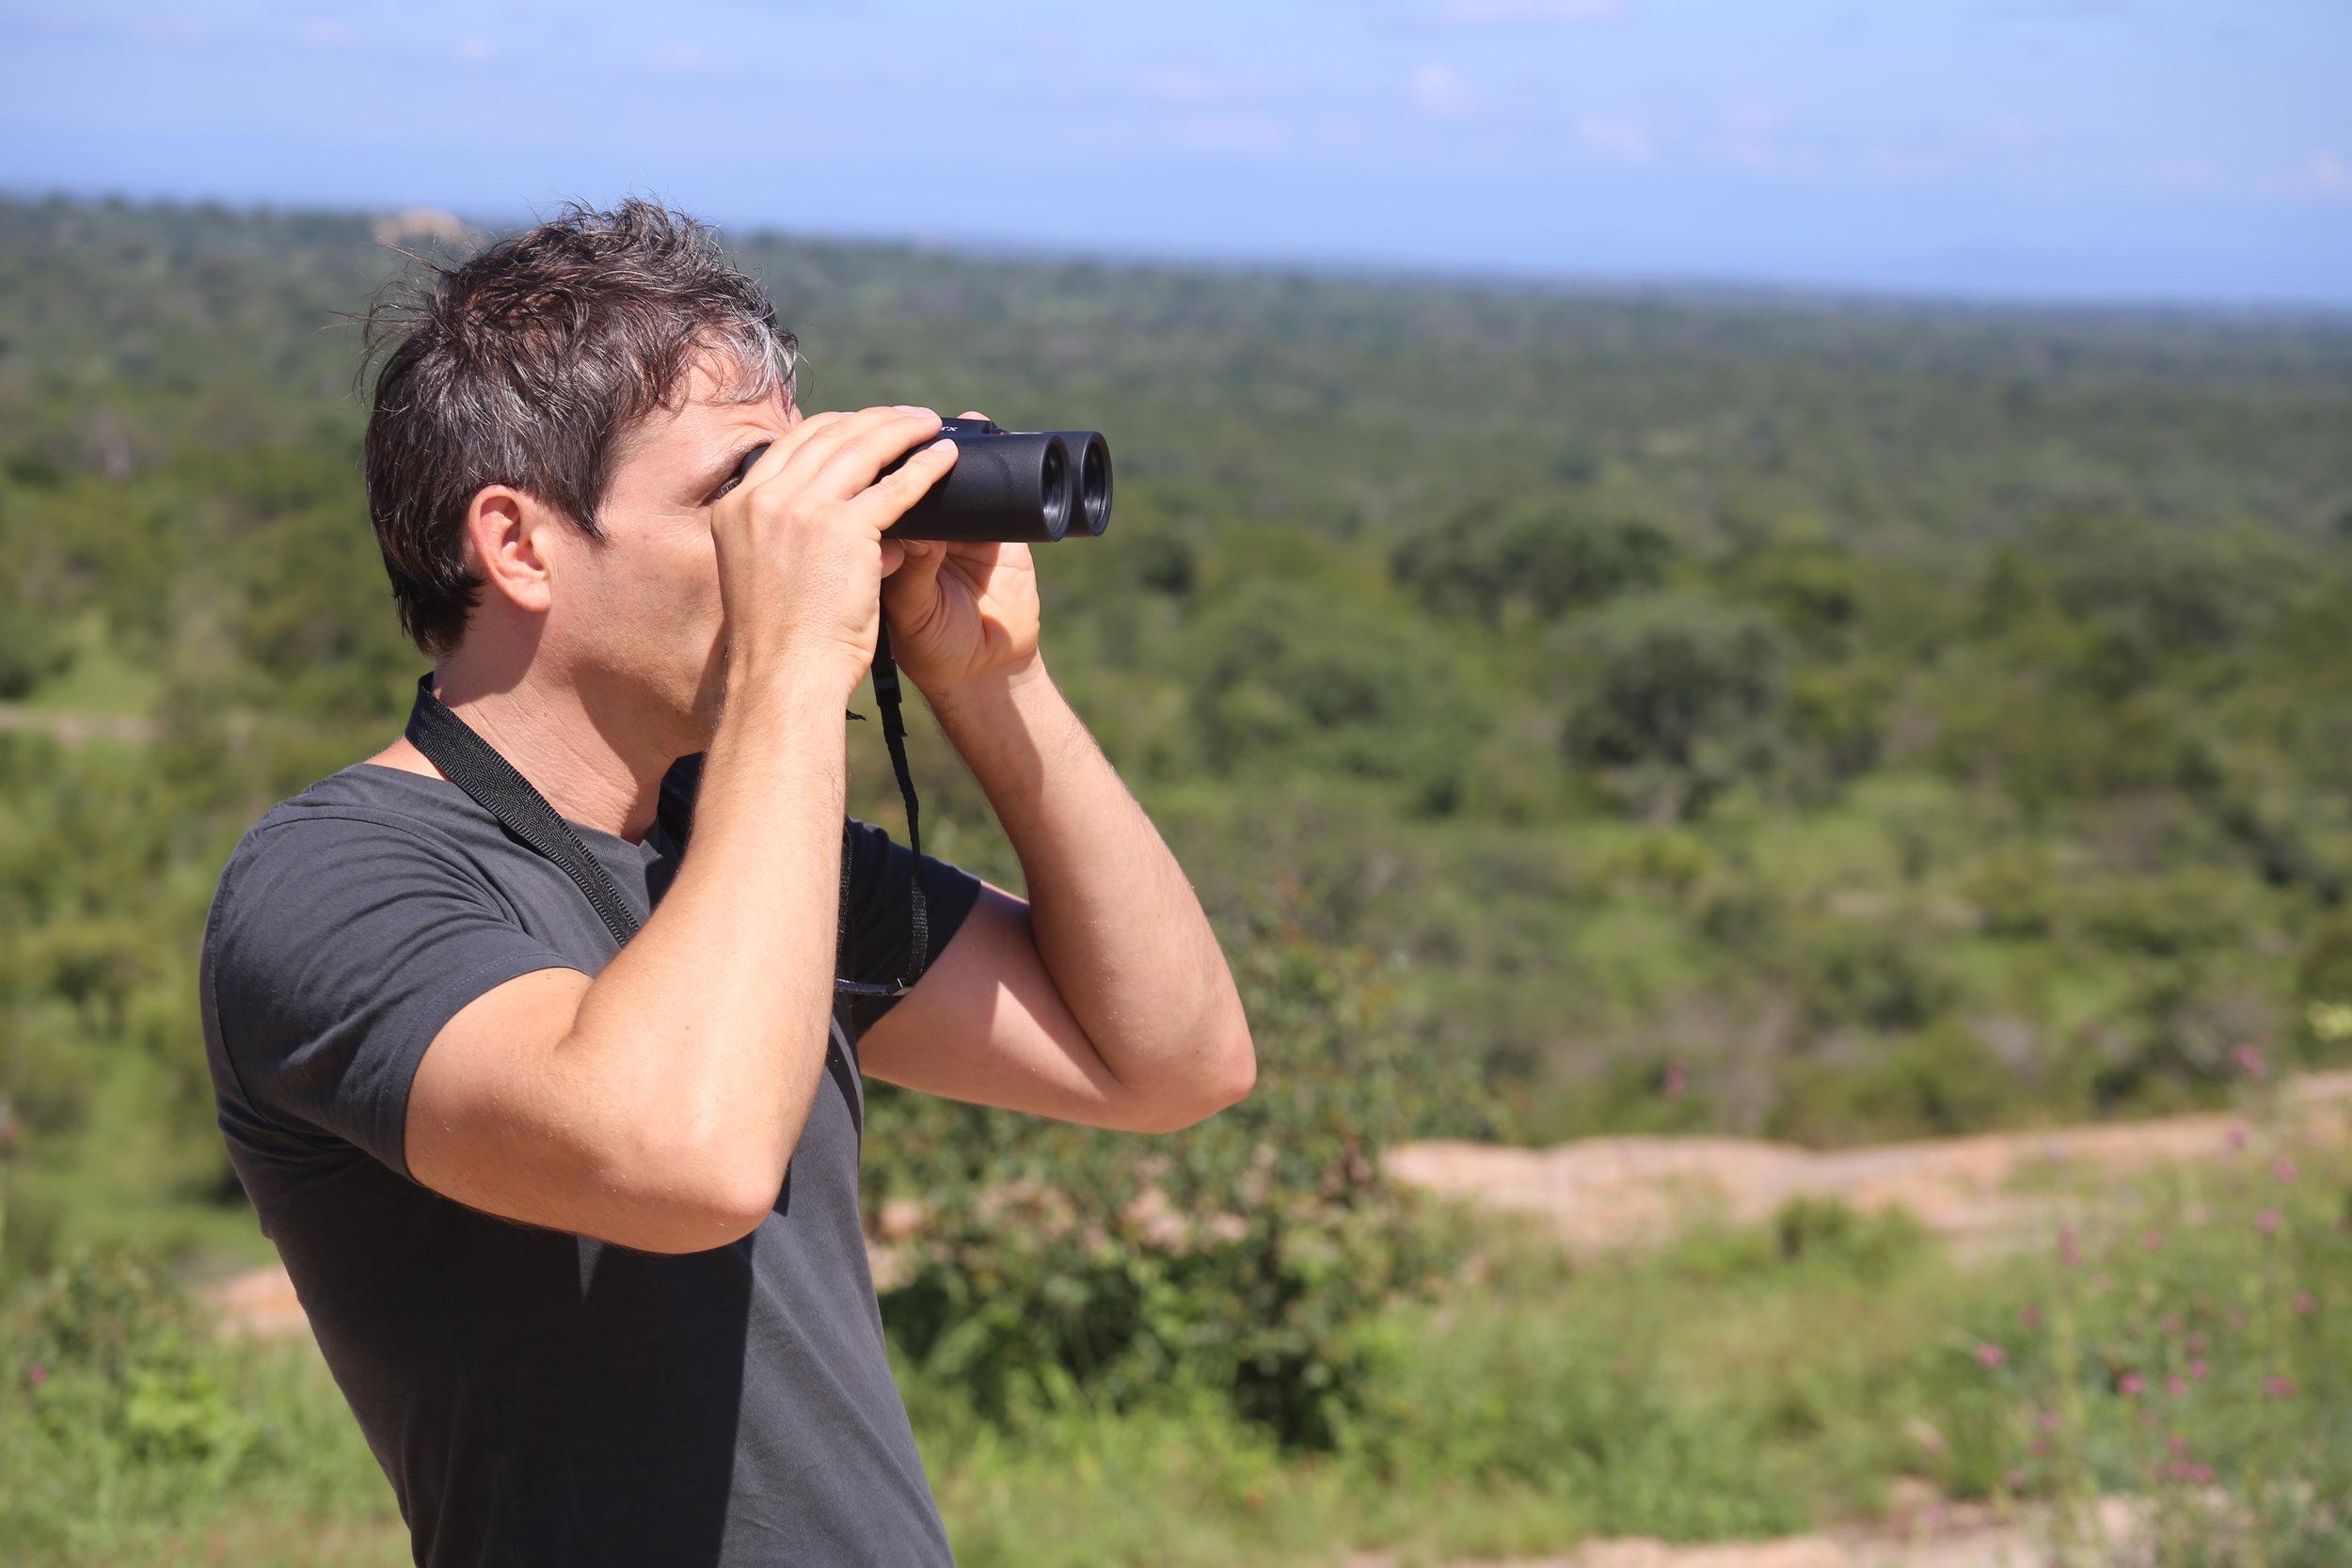 These Celestron 10x42 Safari Binoculars have been put to good use!